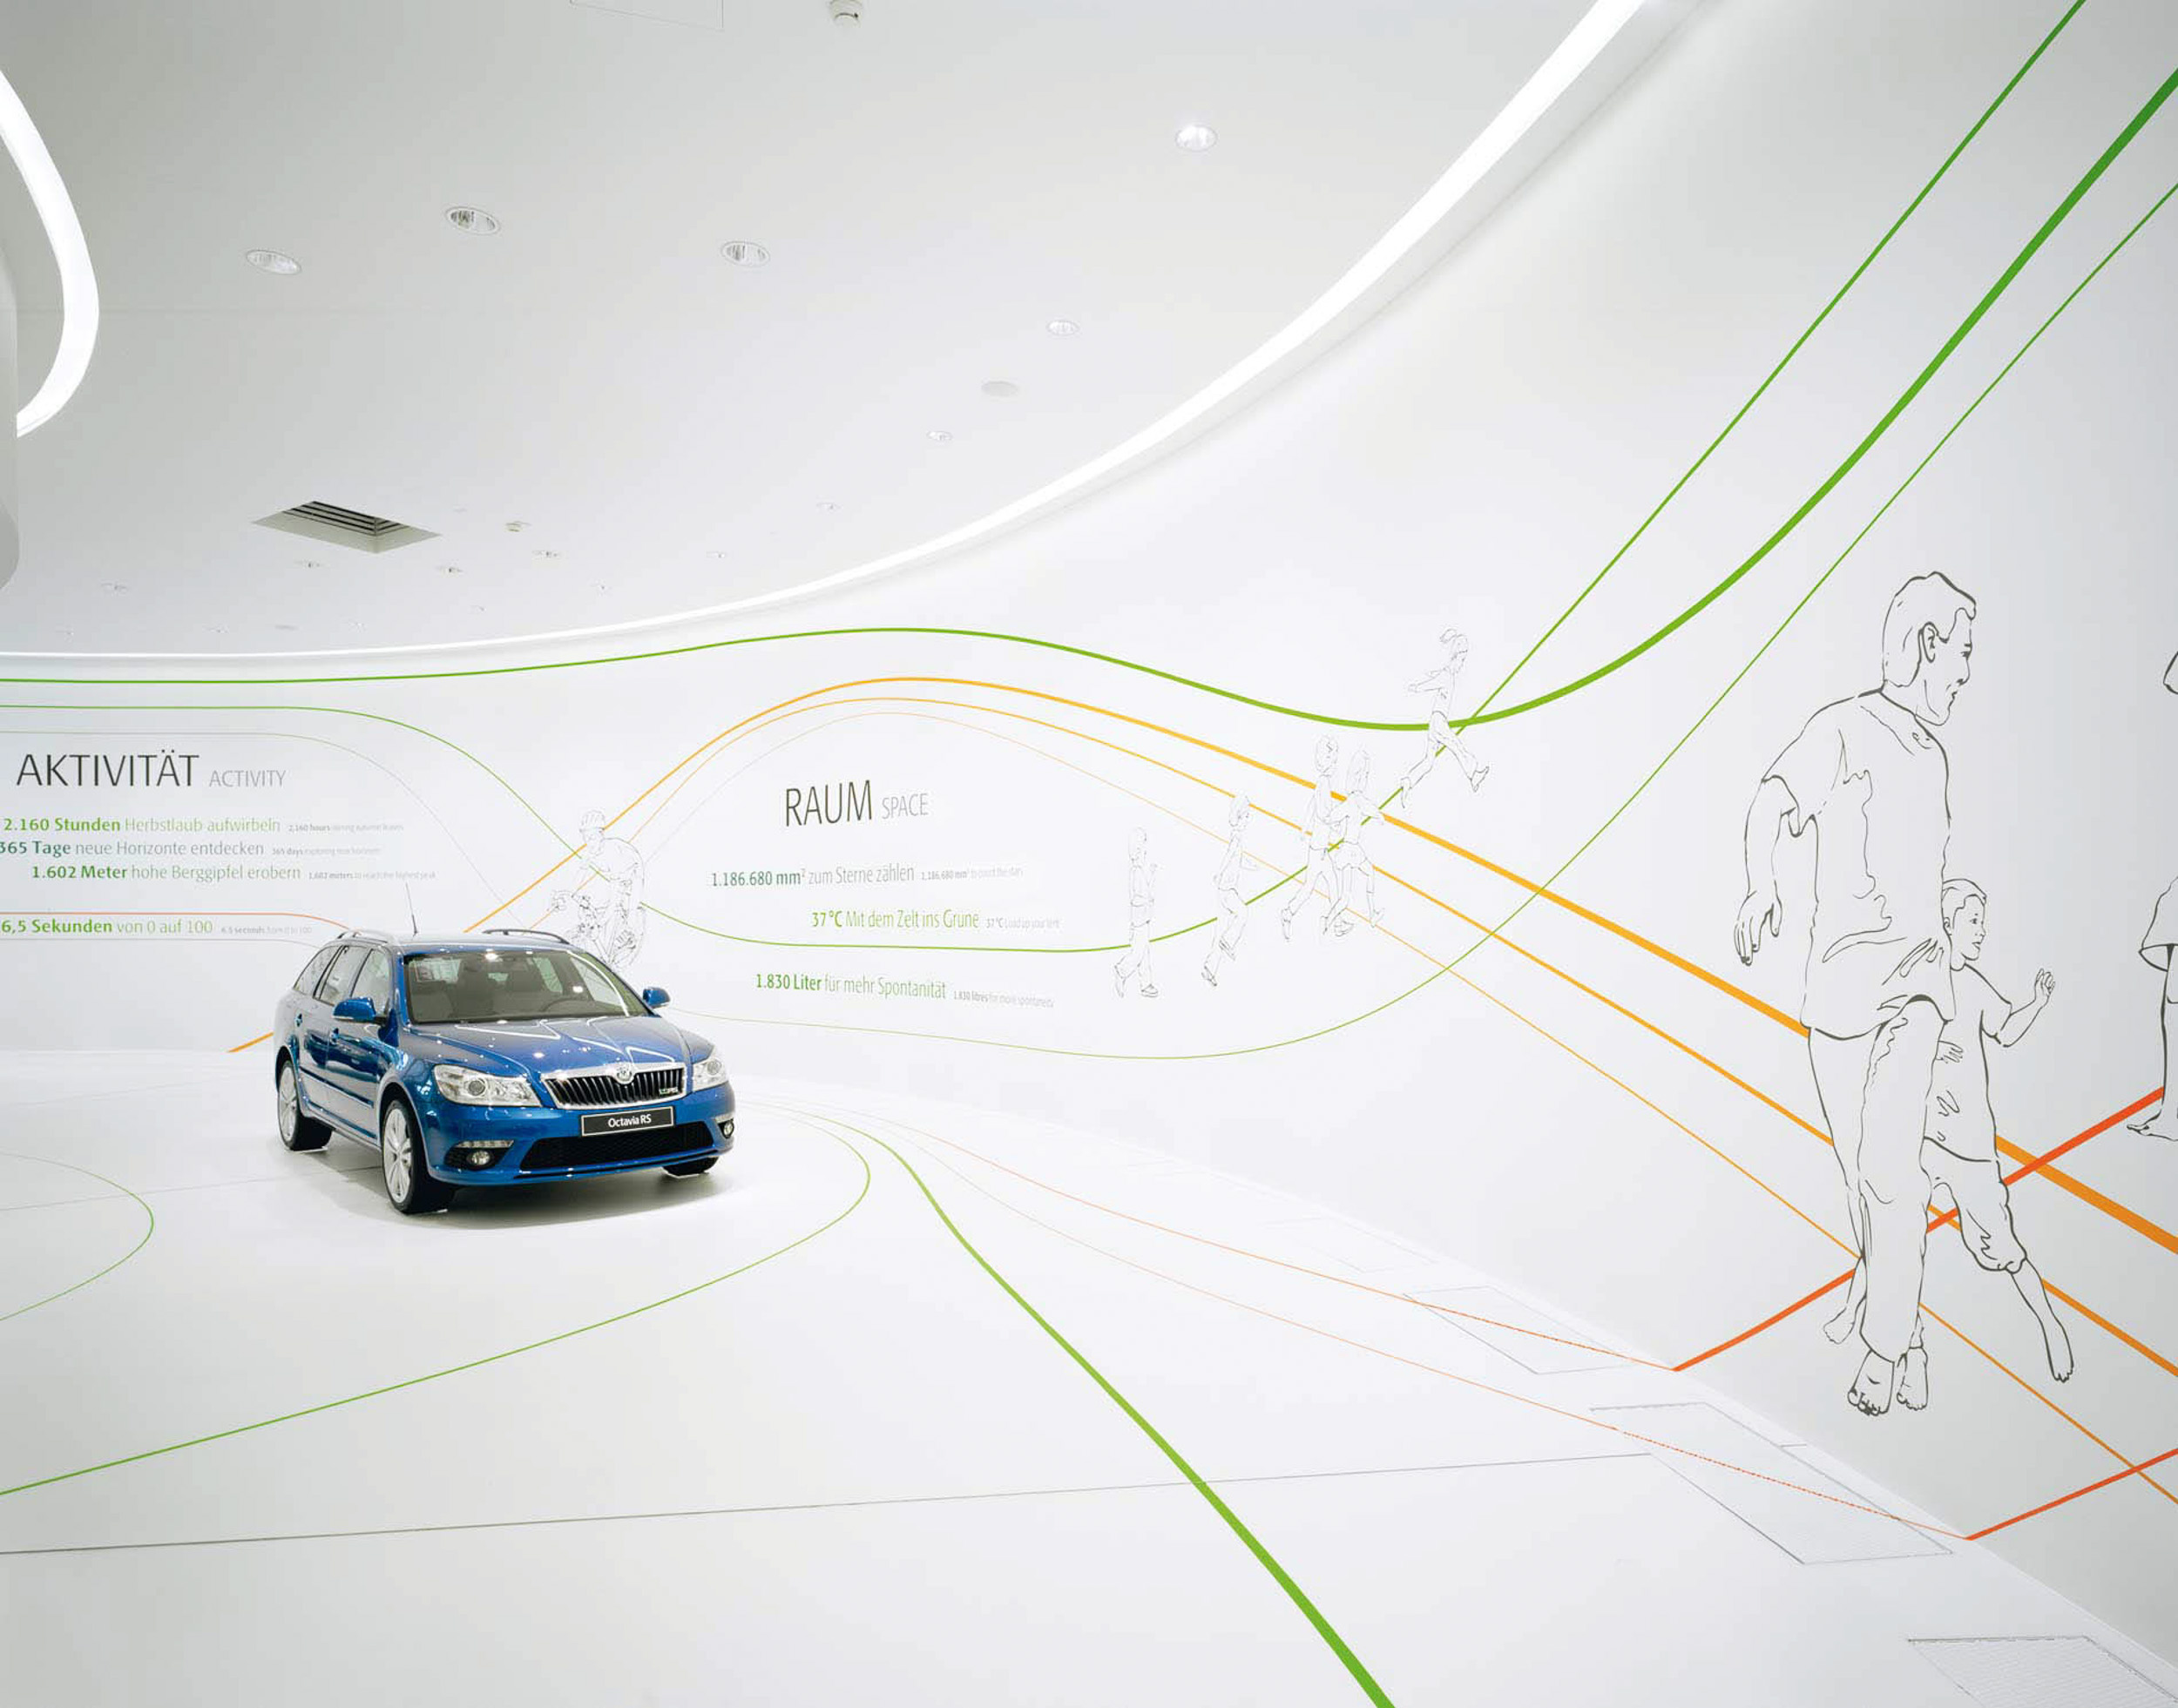 leitsystem-wegeleitsystem-skoda-ausstellung-messebau-linien-wandgrafik.jpg